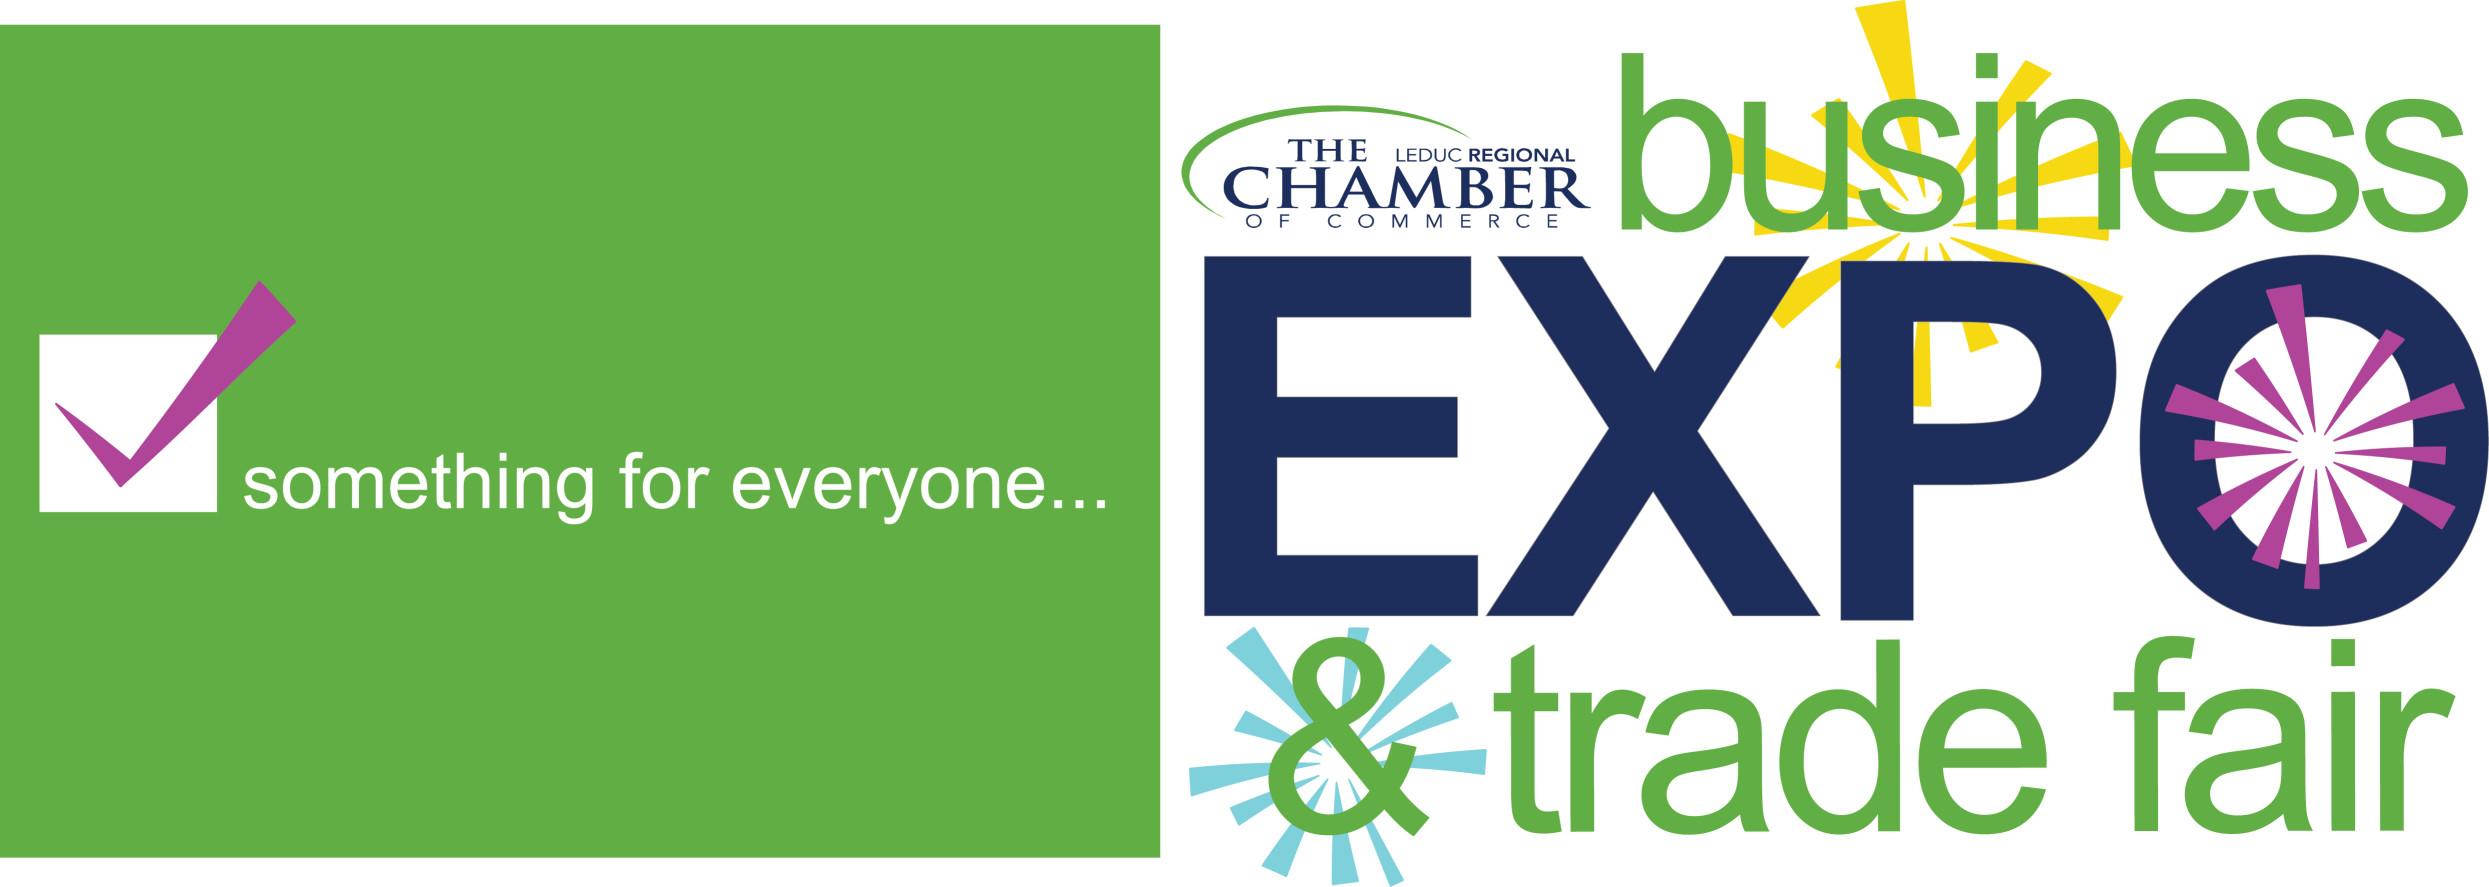 business_expo.jpg